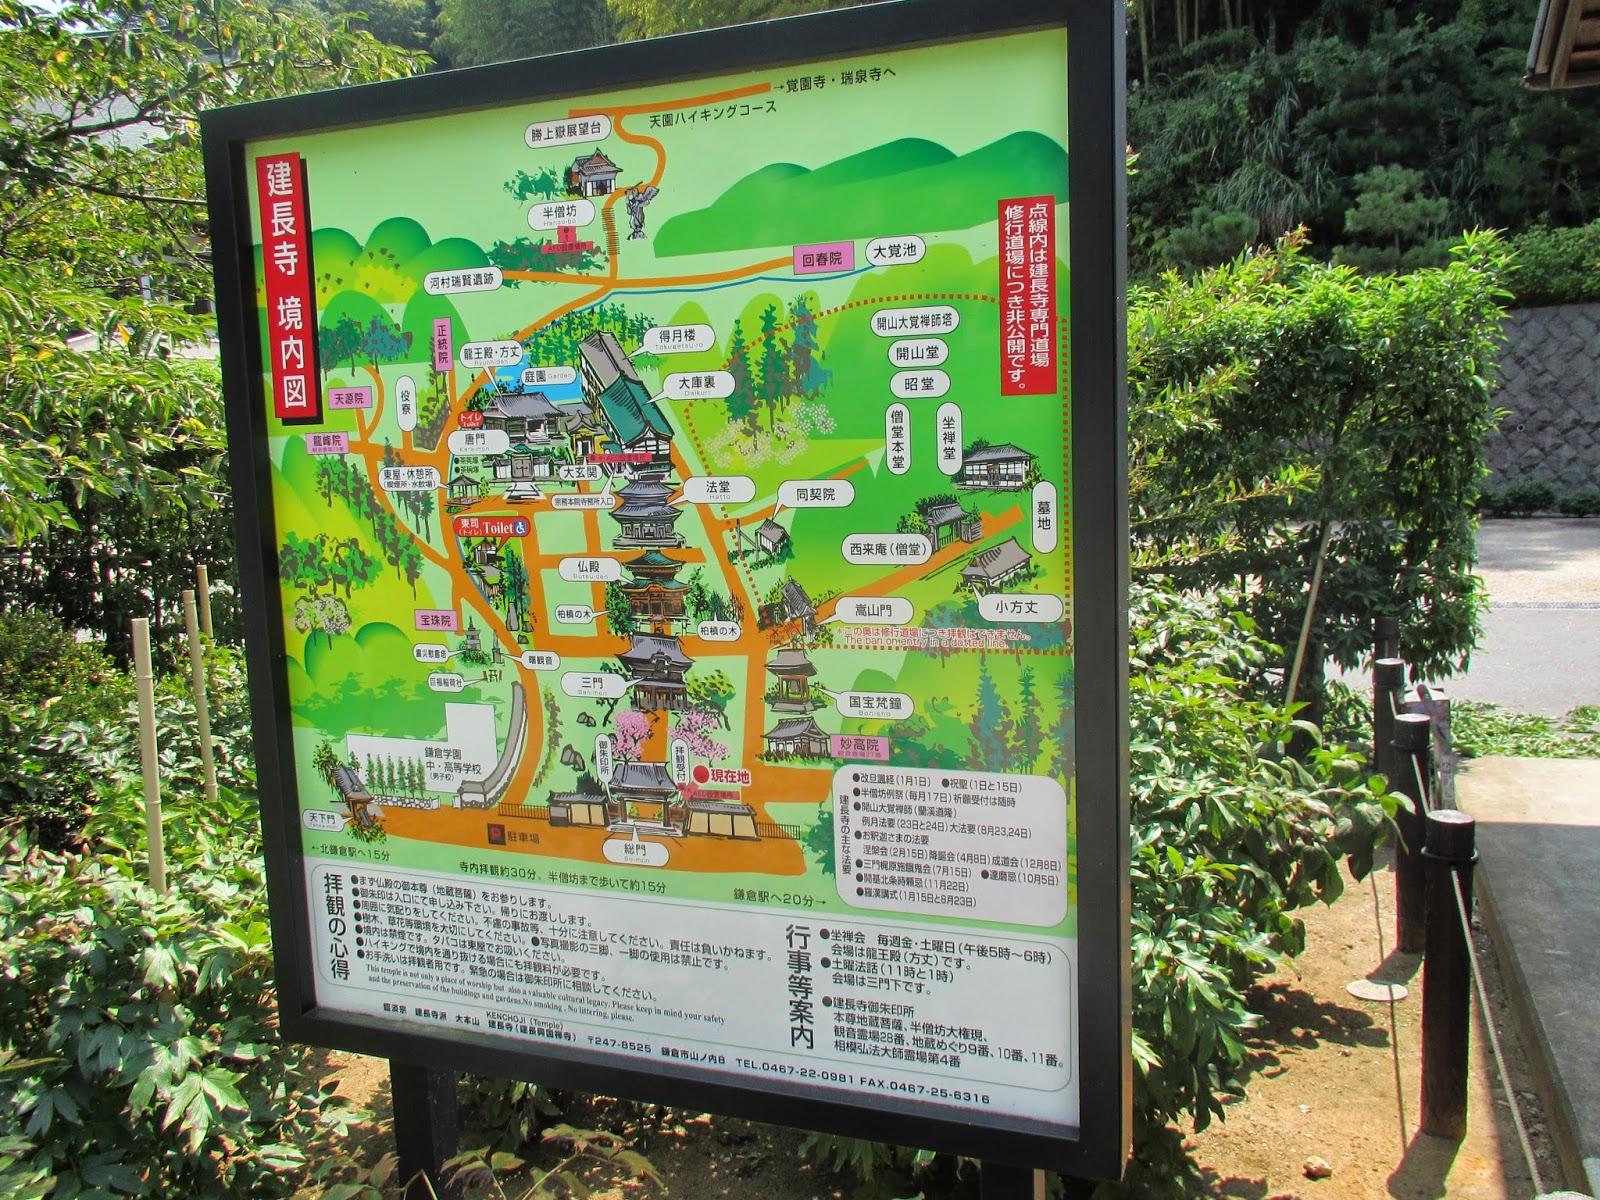 Mapa del templo Kencho-Ji